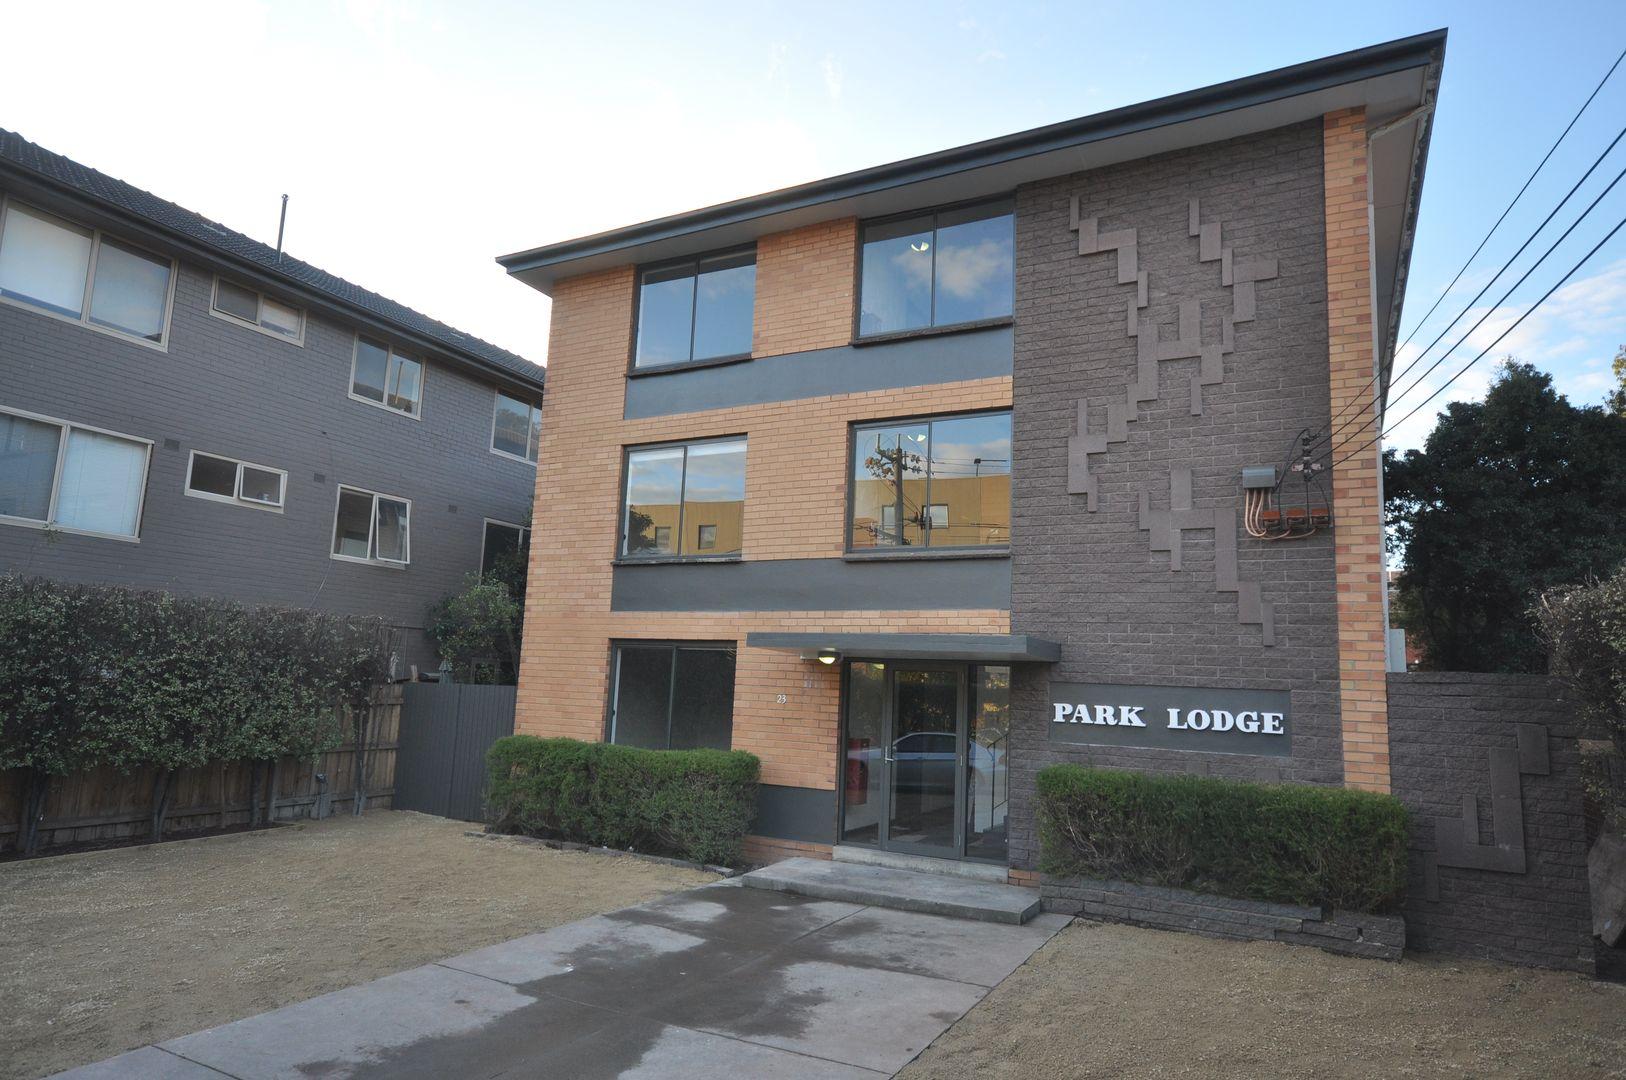 18/23 Park Street, Hawthorn VIC 3122, Image 0